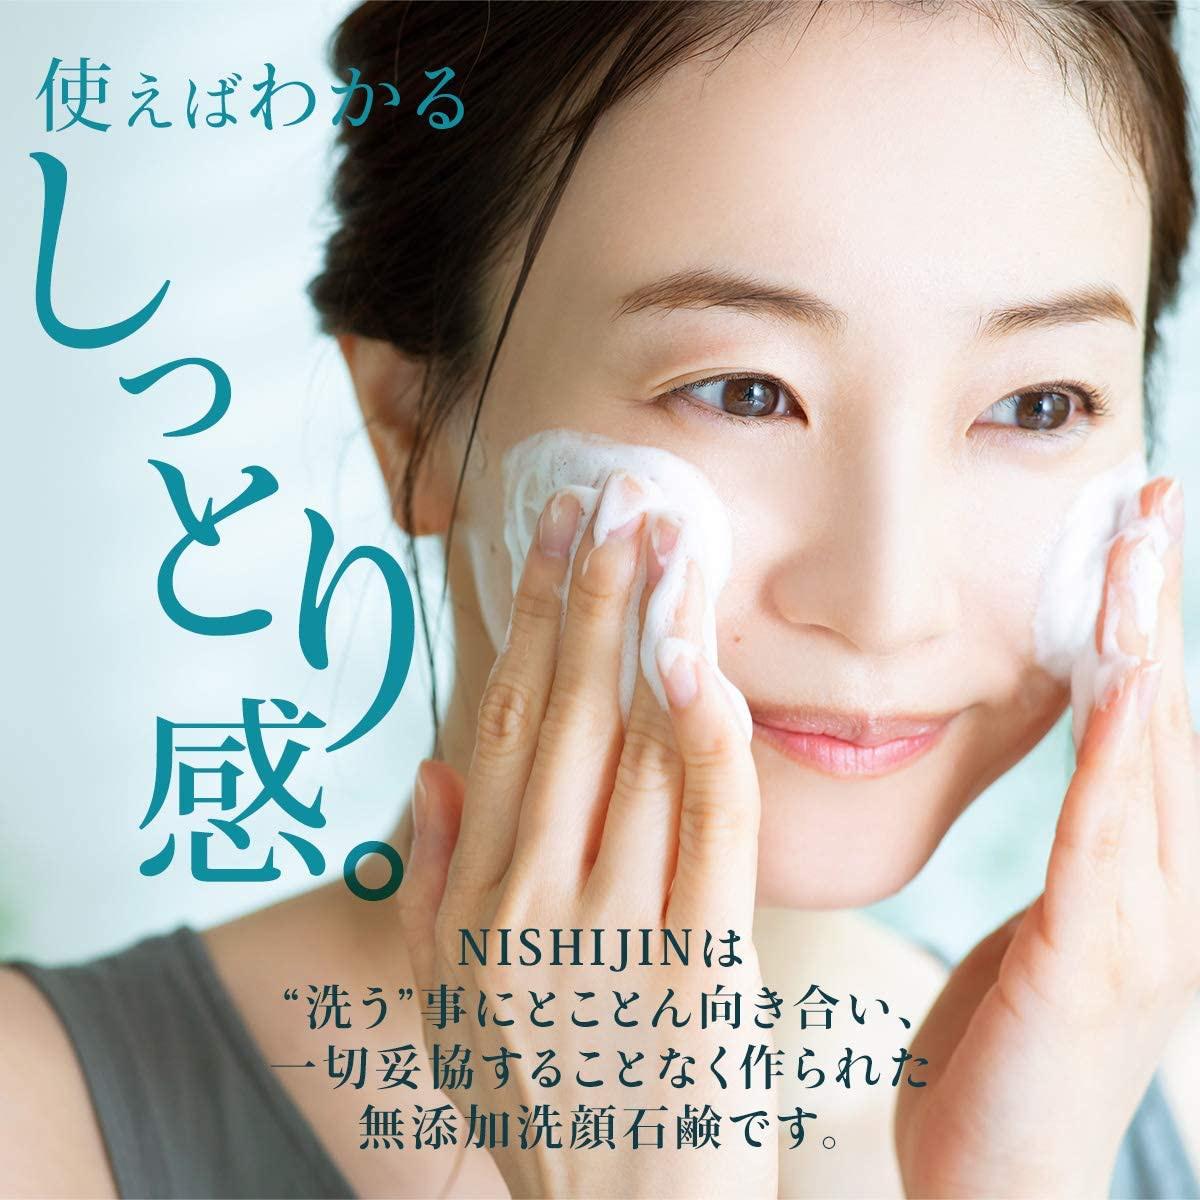 西陣石鹸(NISHIJIN SOAP) 洗顔用石鹸の商品画像5